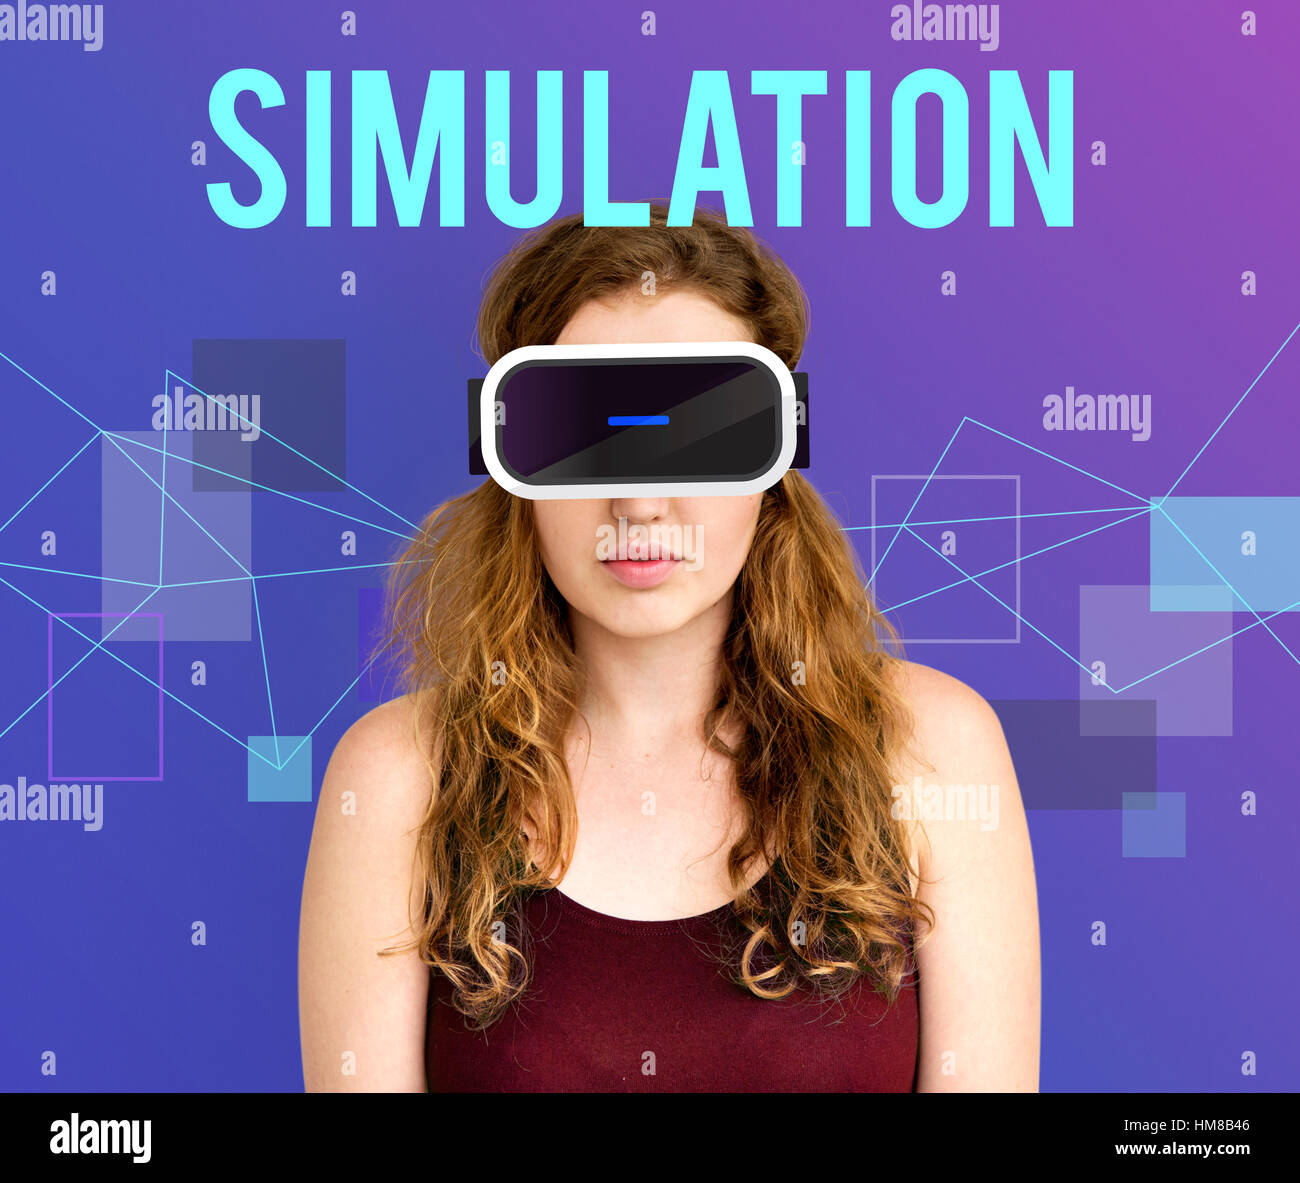 Technology Innovation Simulation Gadget Concept - Stock Image